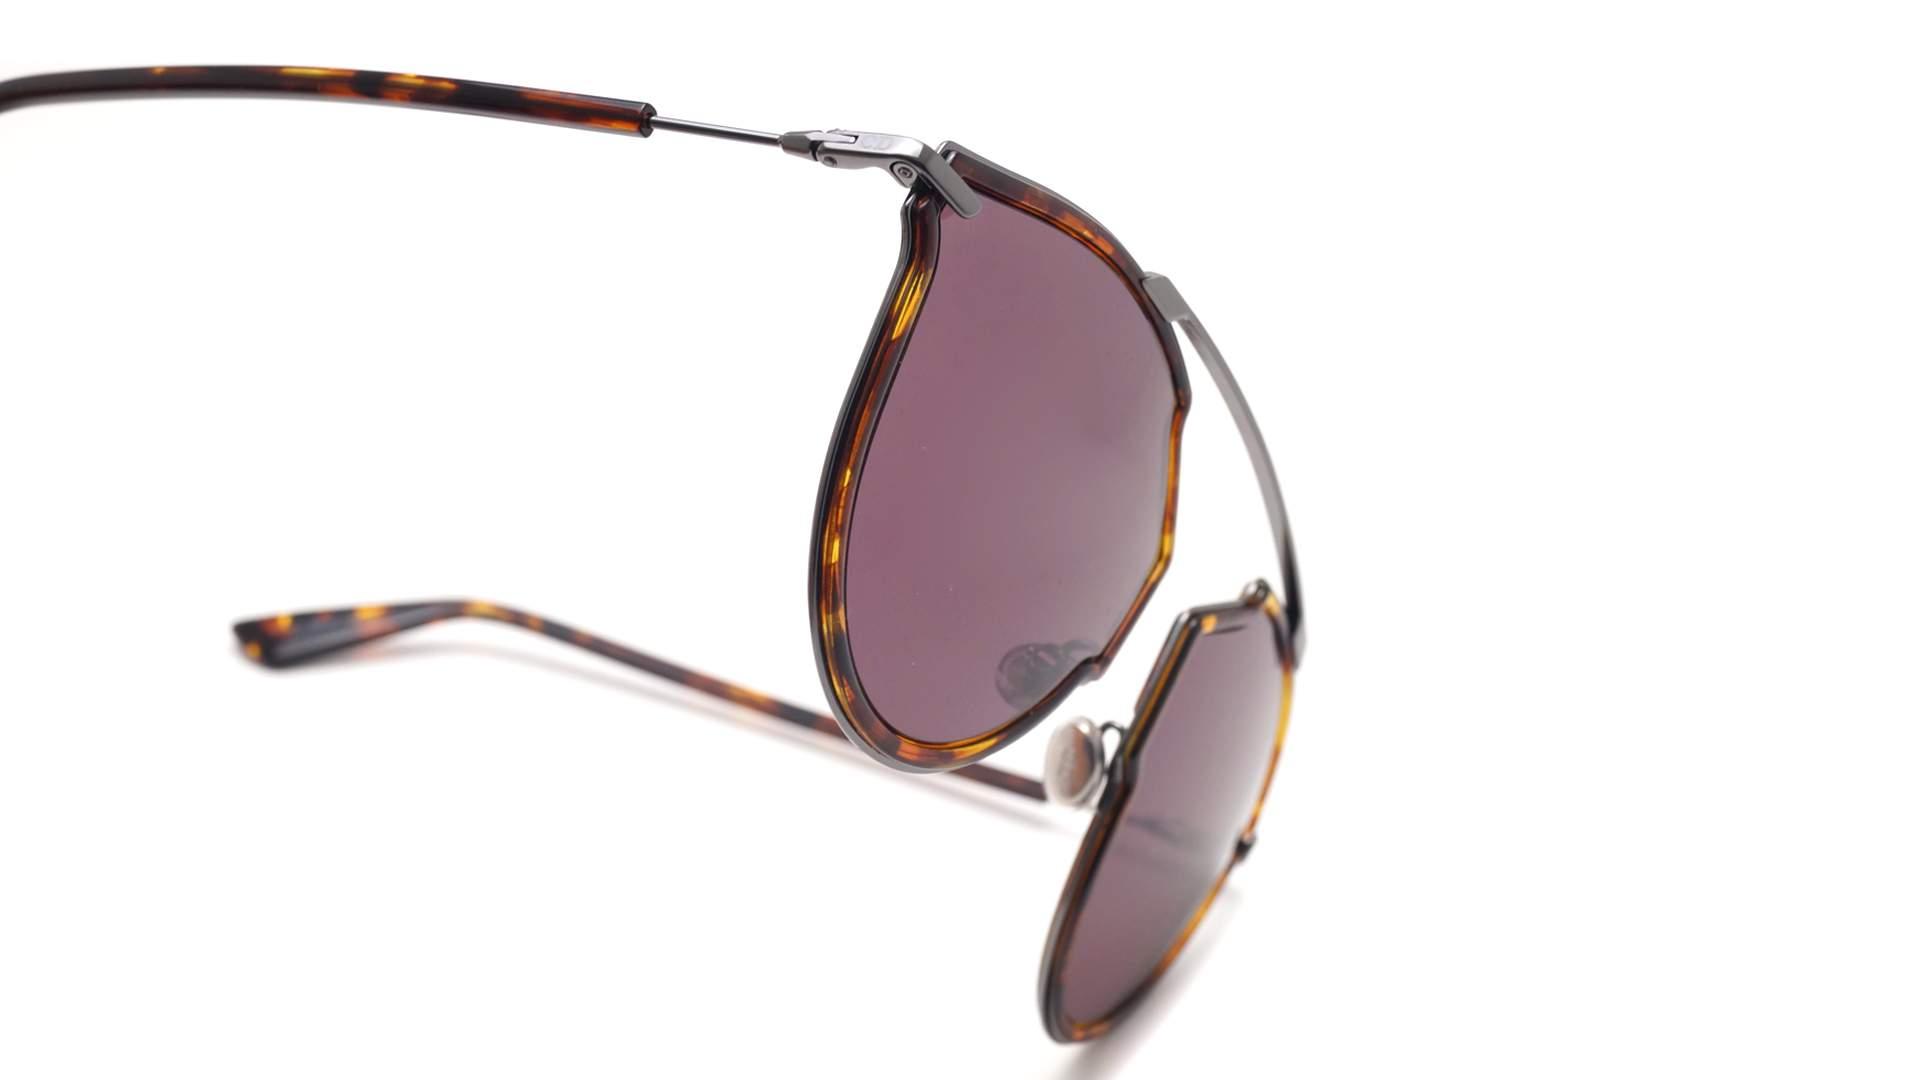 5547c3b20d4bc Sunglasses Dior SoReal Rise Tortoise DIORSOREALRISE H2HUR 58-17 Large